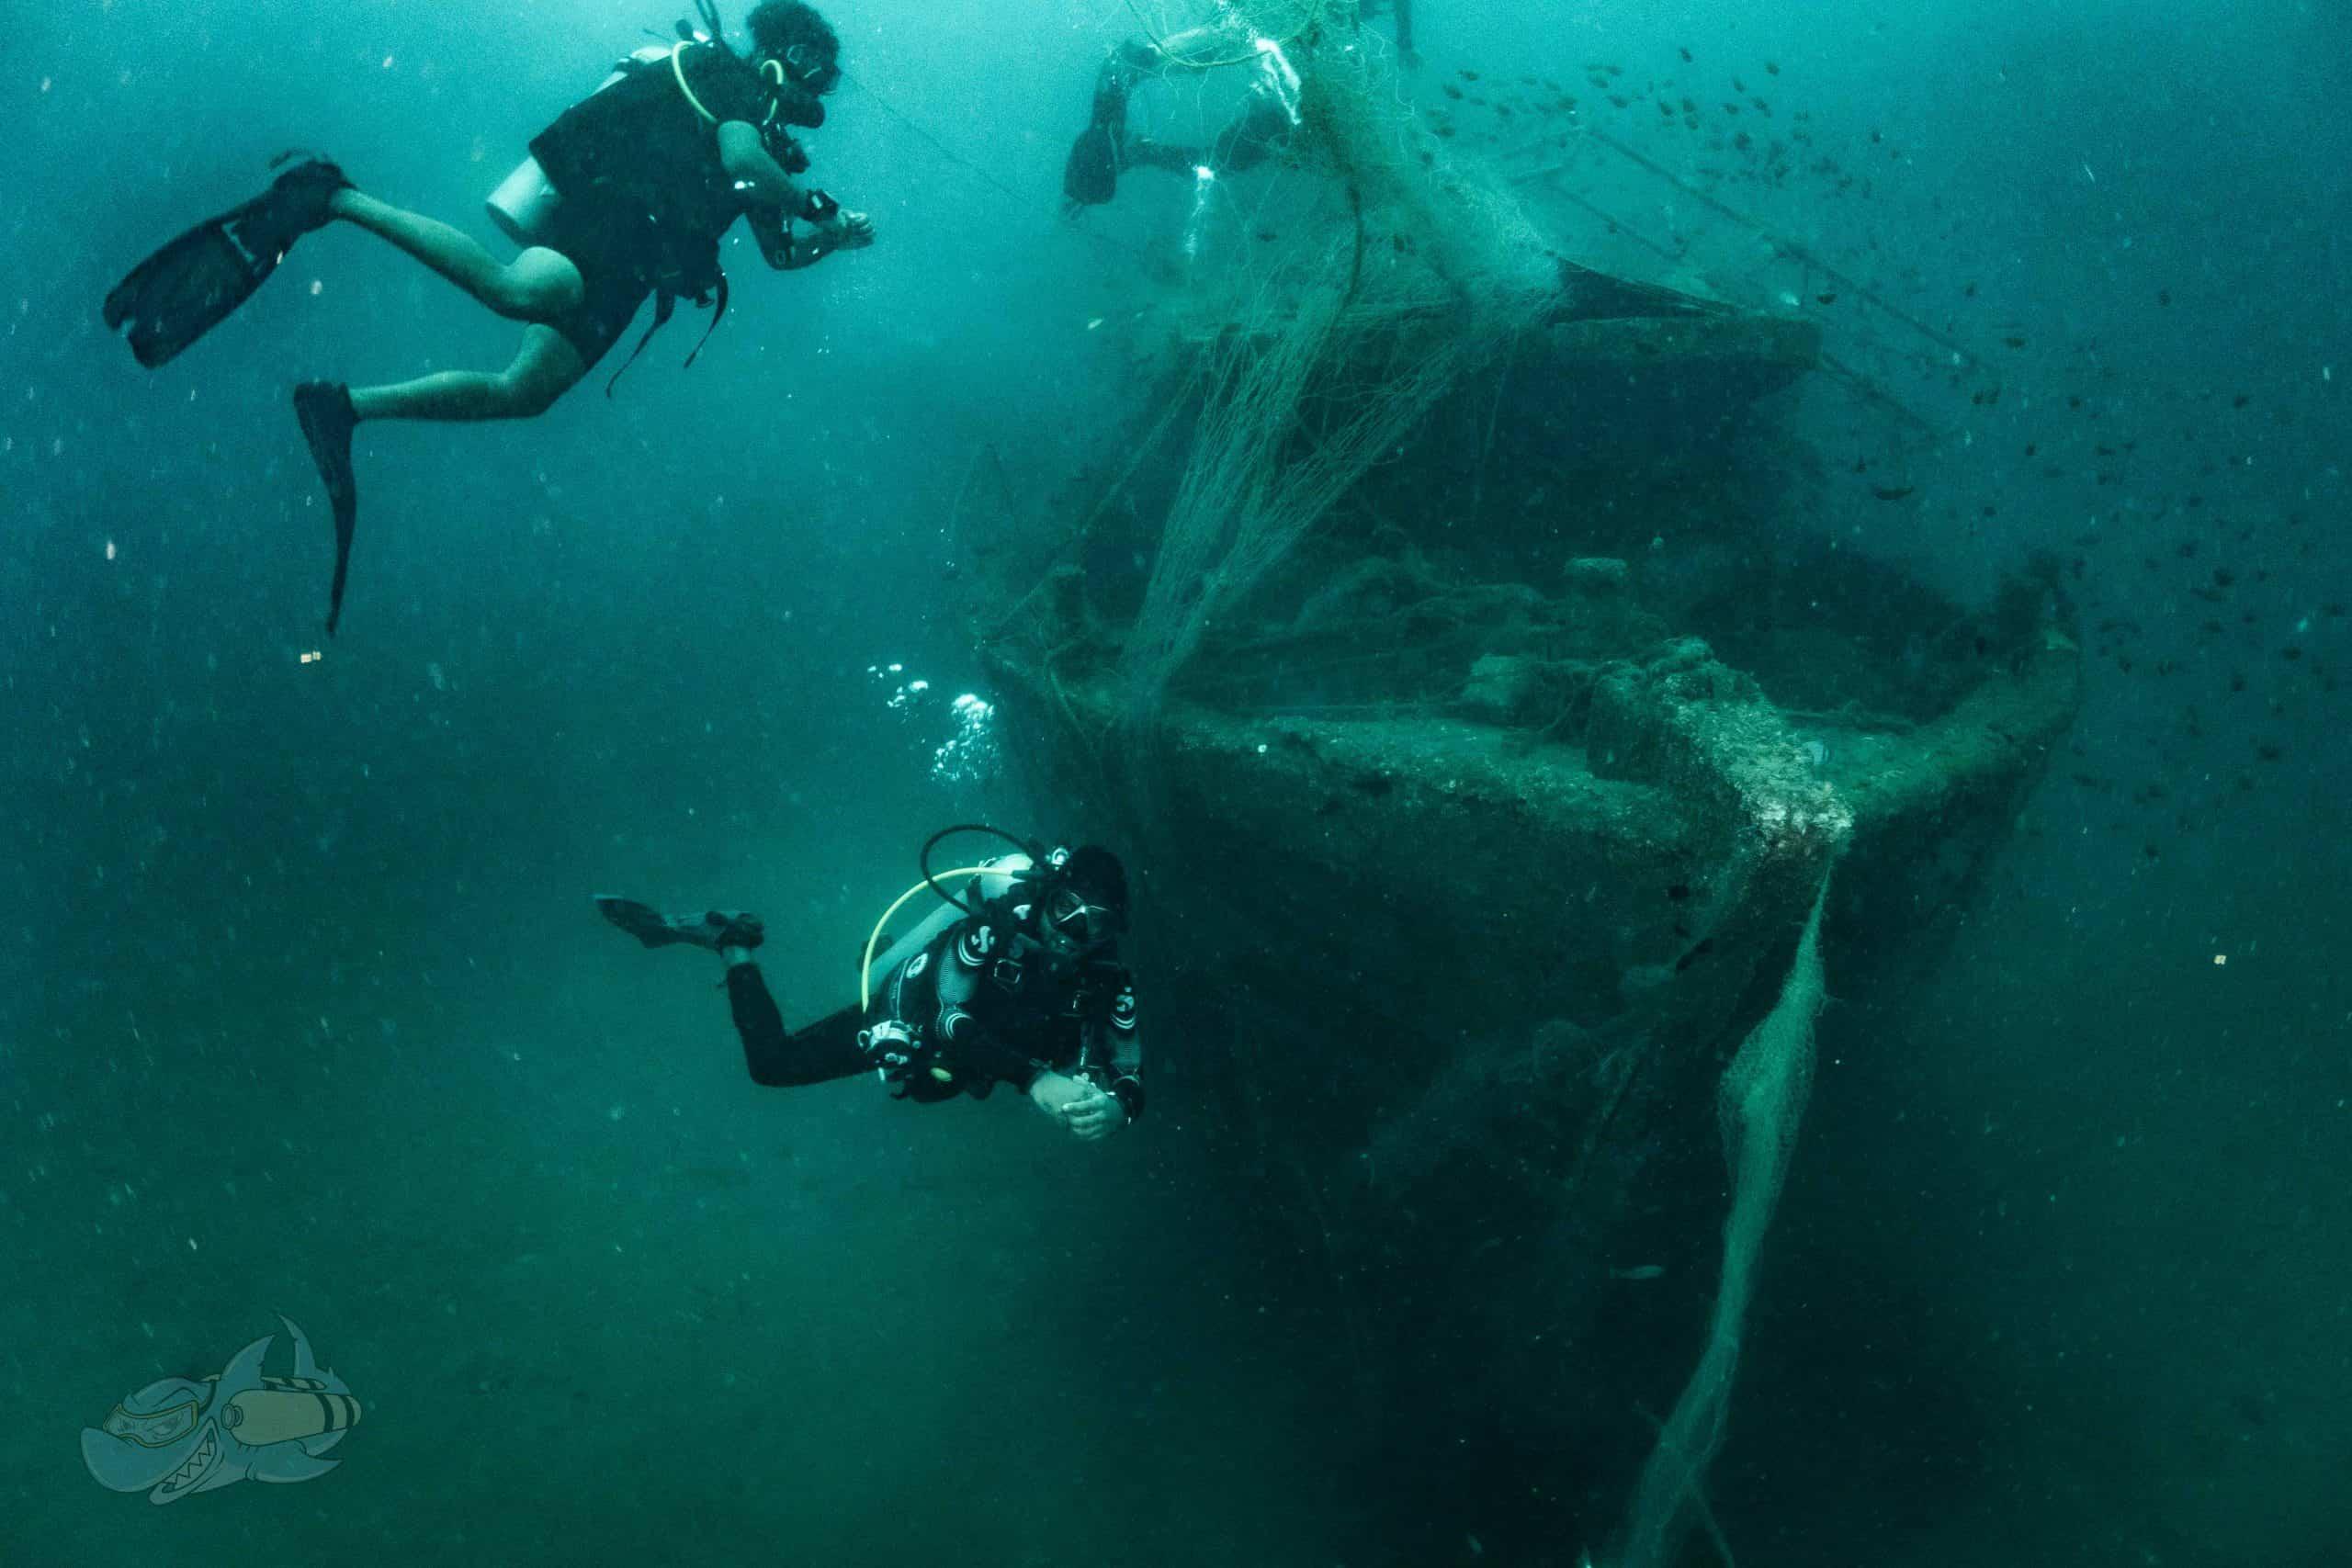 Non-penetration diving at the trawler wreck